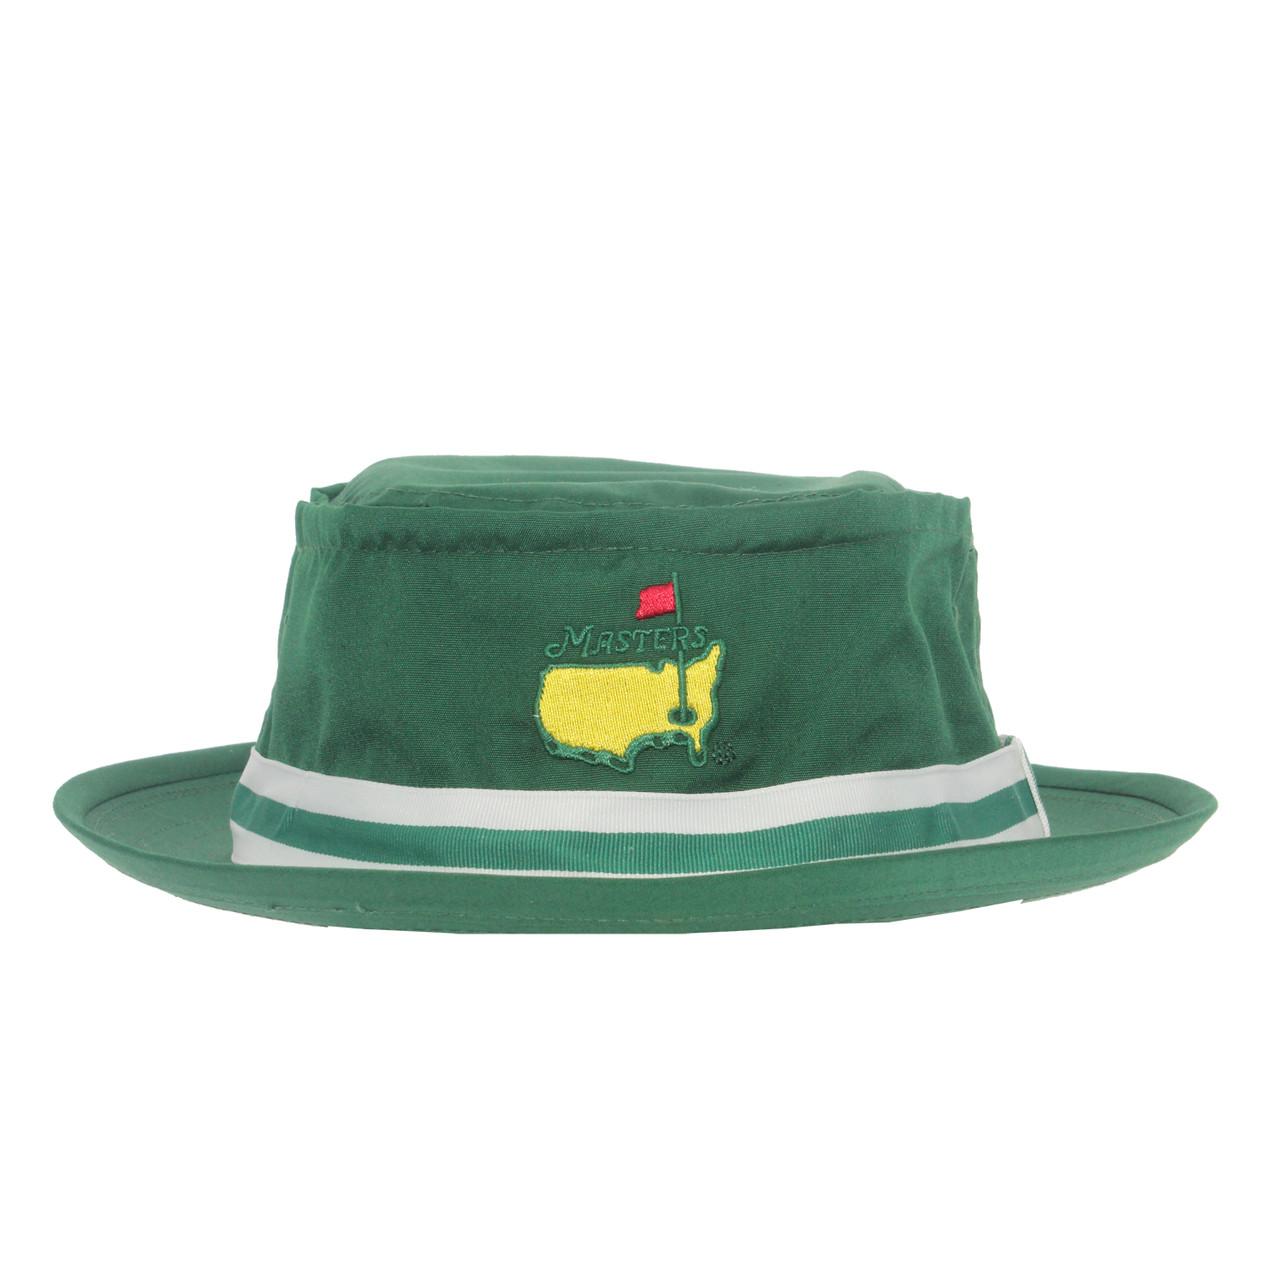 37e8be868f0 Masters Green Bucket Hat - Masters Hats   Visors